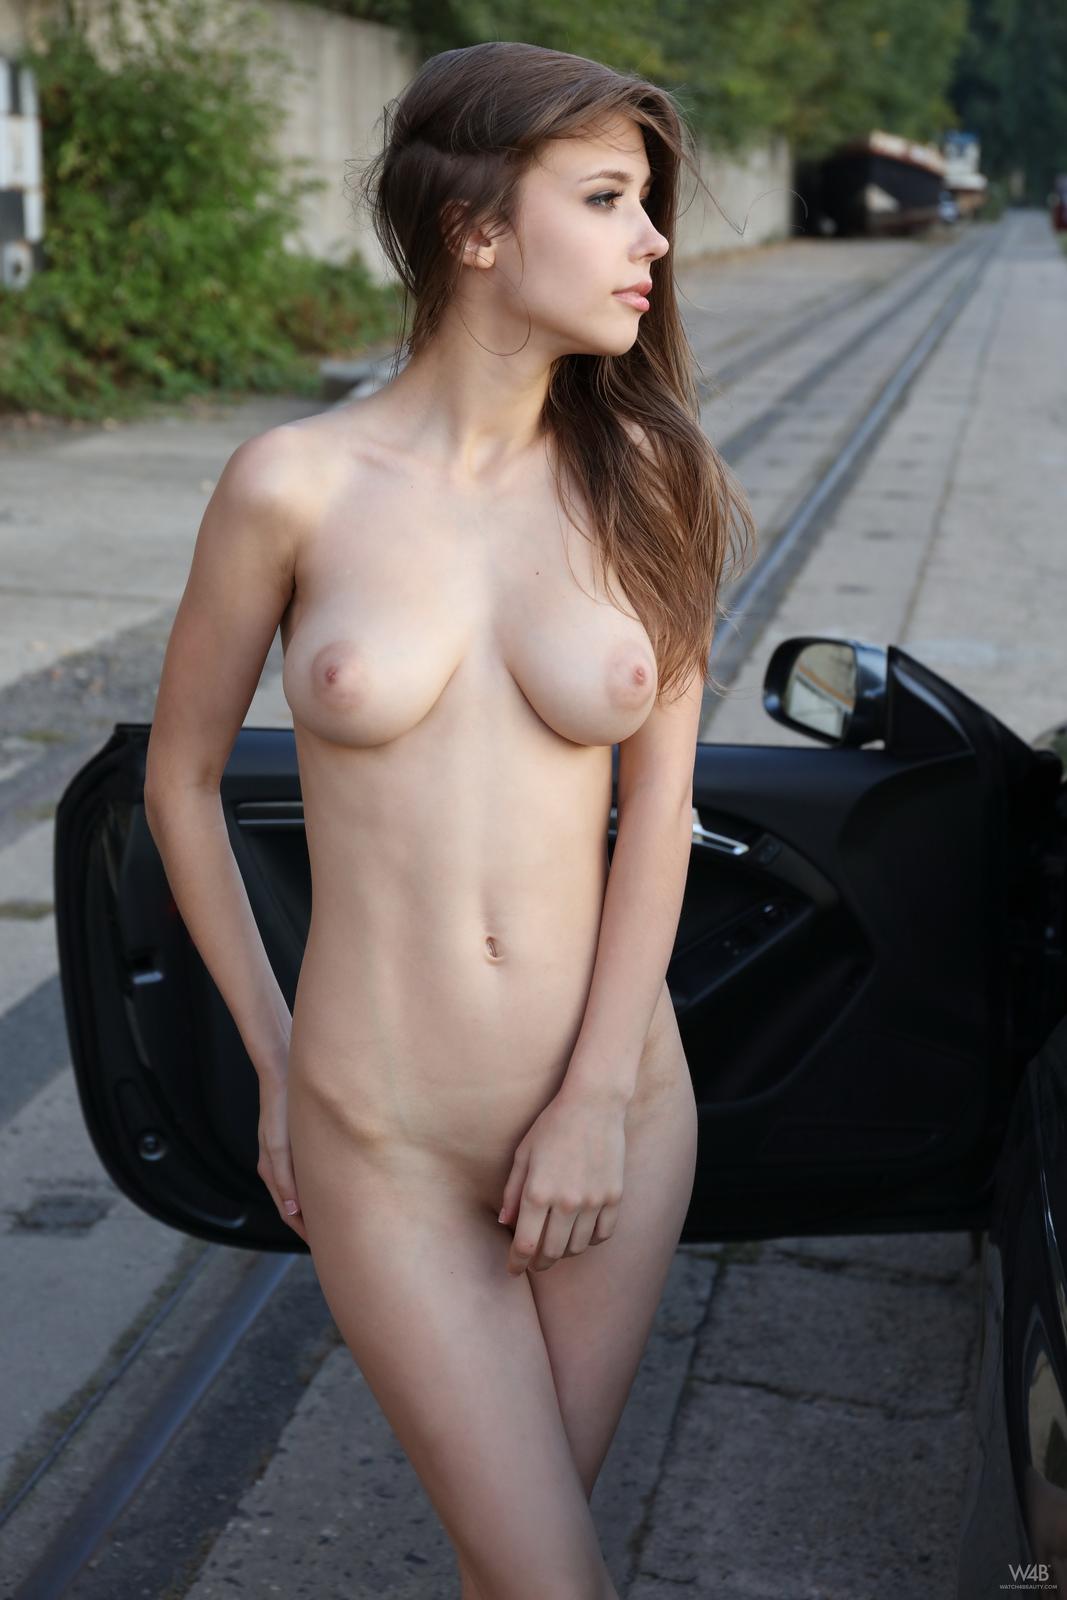 https://redbust.com/stuff/mila-azul-audi-rs5/milla-nude-audi-rs5-cars-pussy-watch4beauty-36.jpg